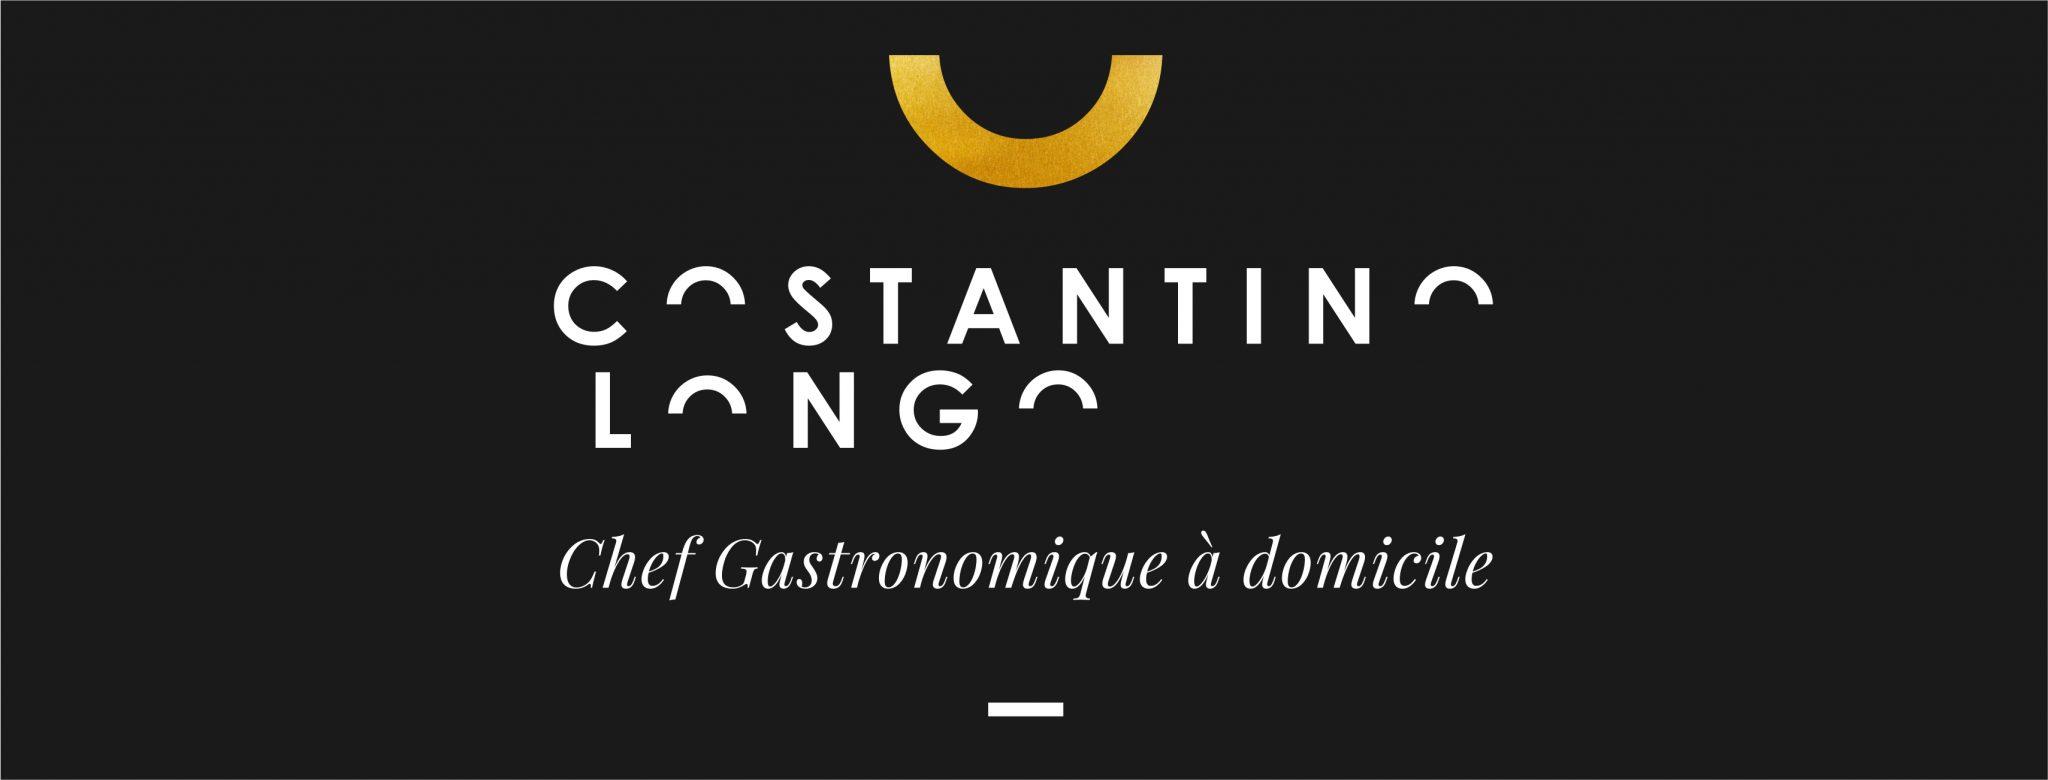 Costantino Longo – Chef Gastronomique à domicile